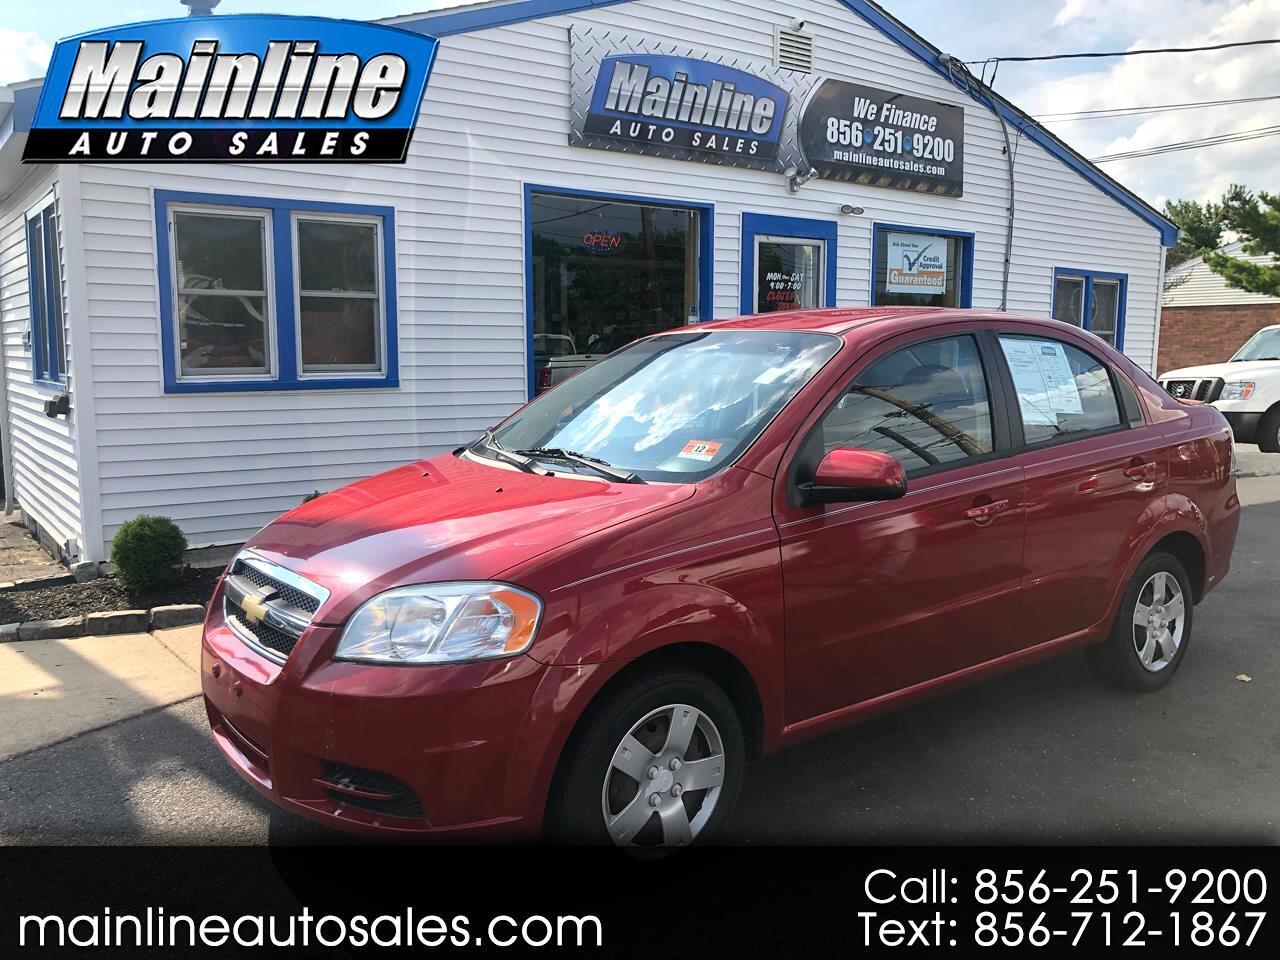 2011 Chevrolet Aveo 4dr Sdn LT w/1LT